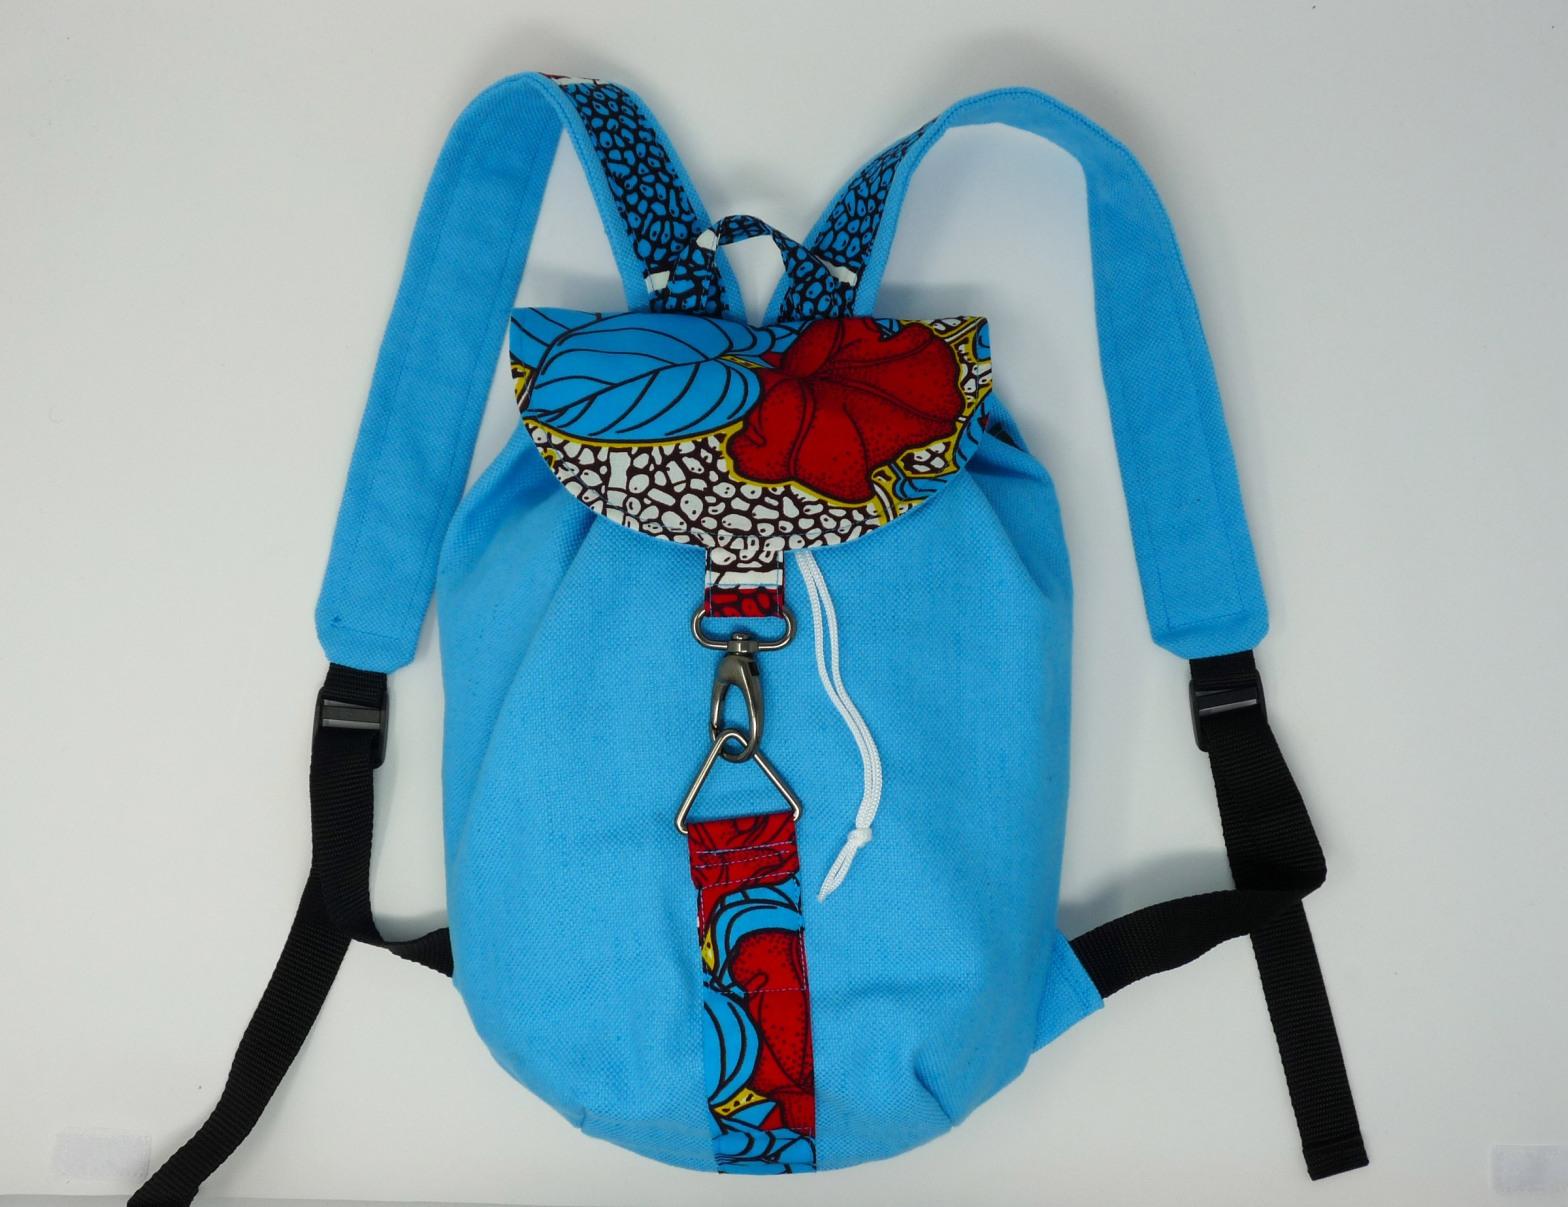 Sac à dos turquoise et pagne rouge et turquoise